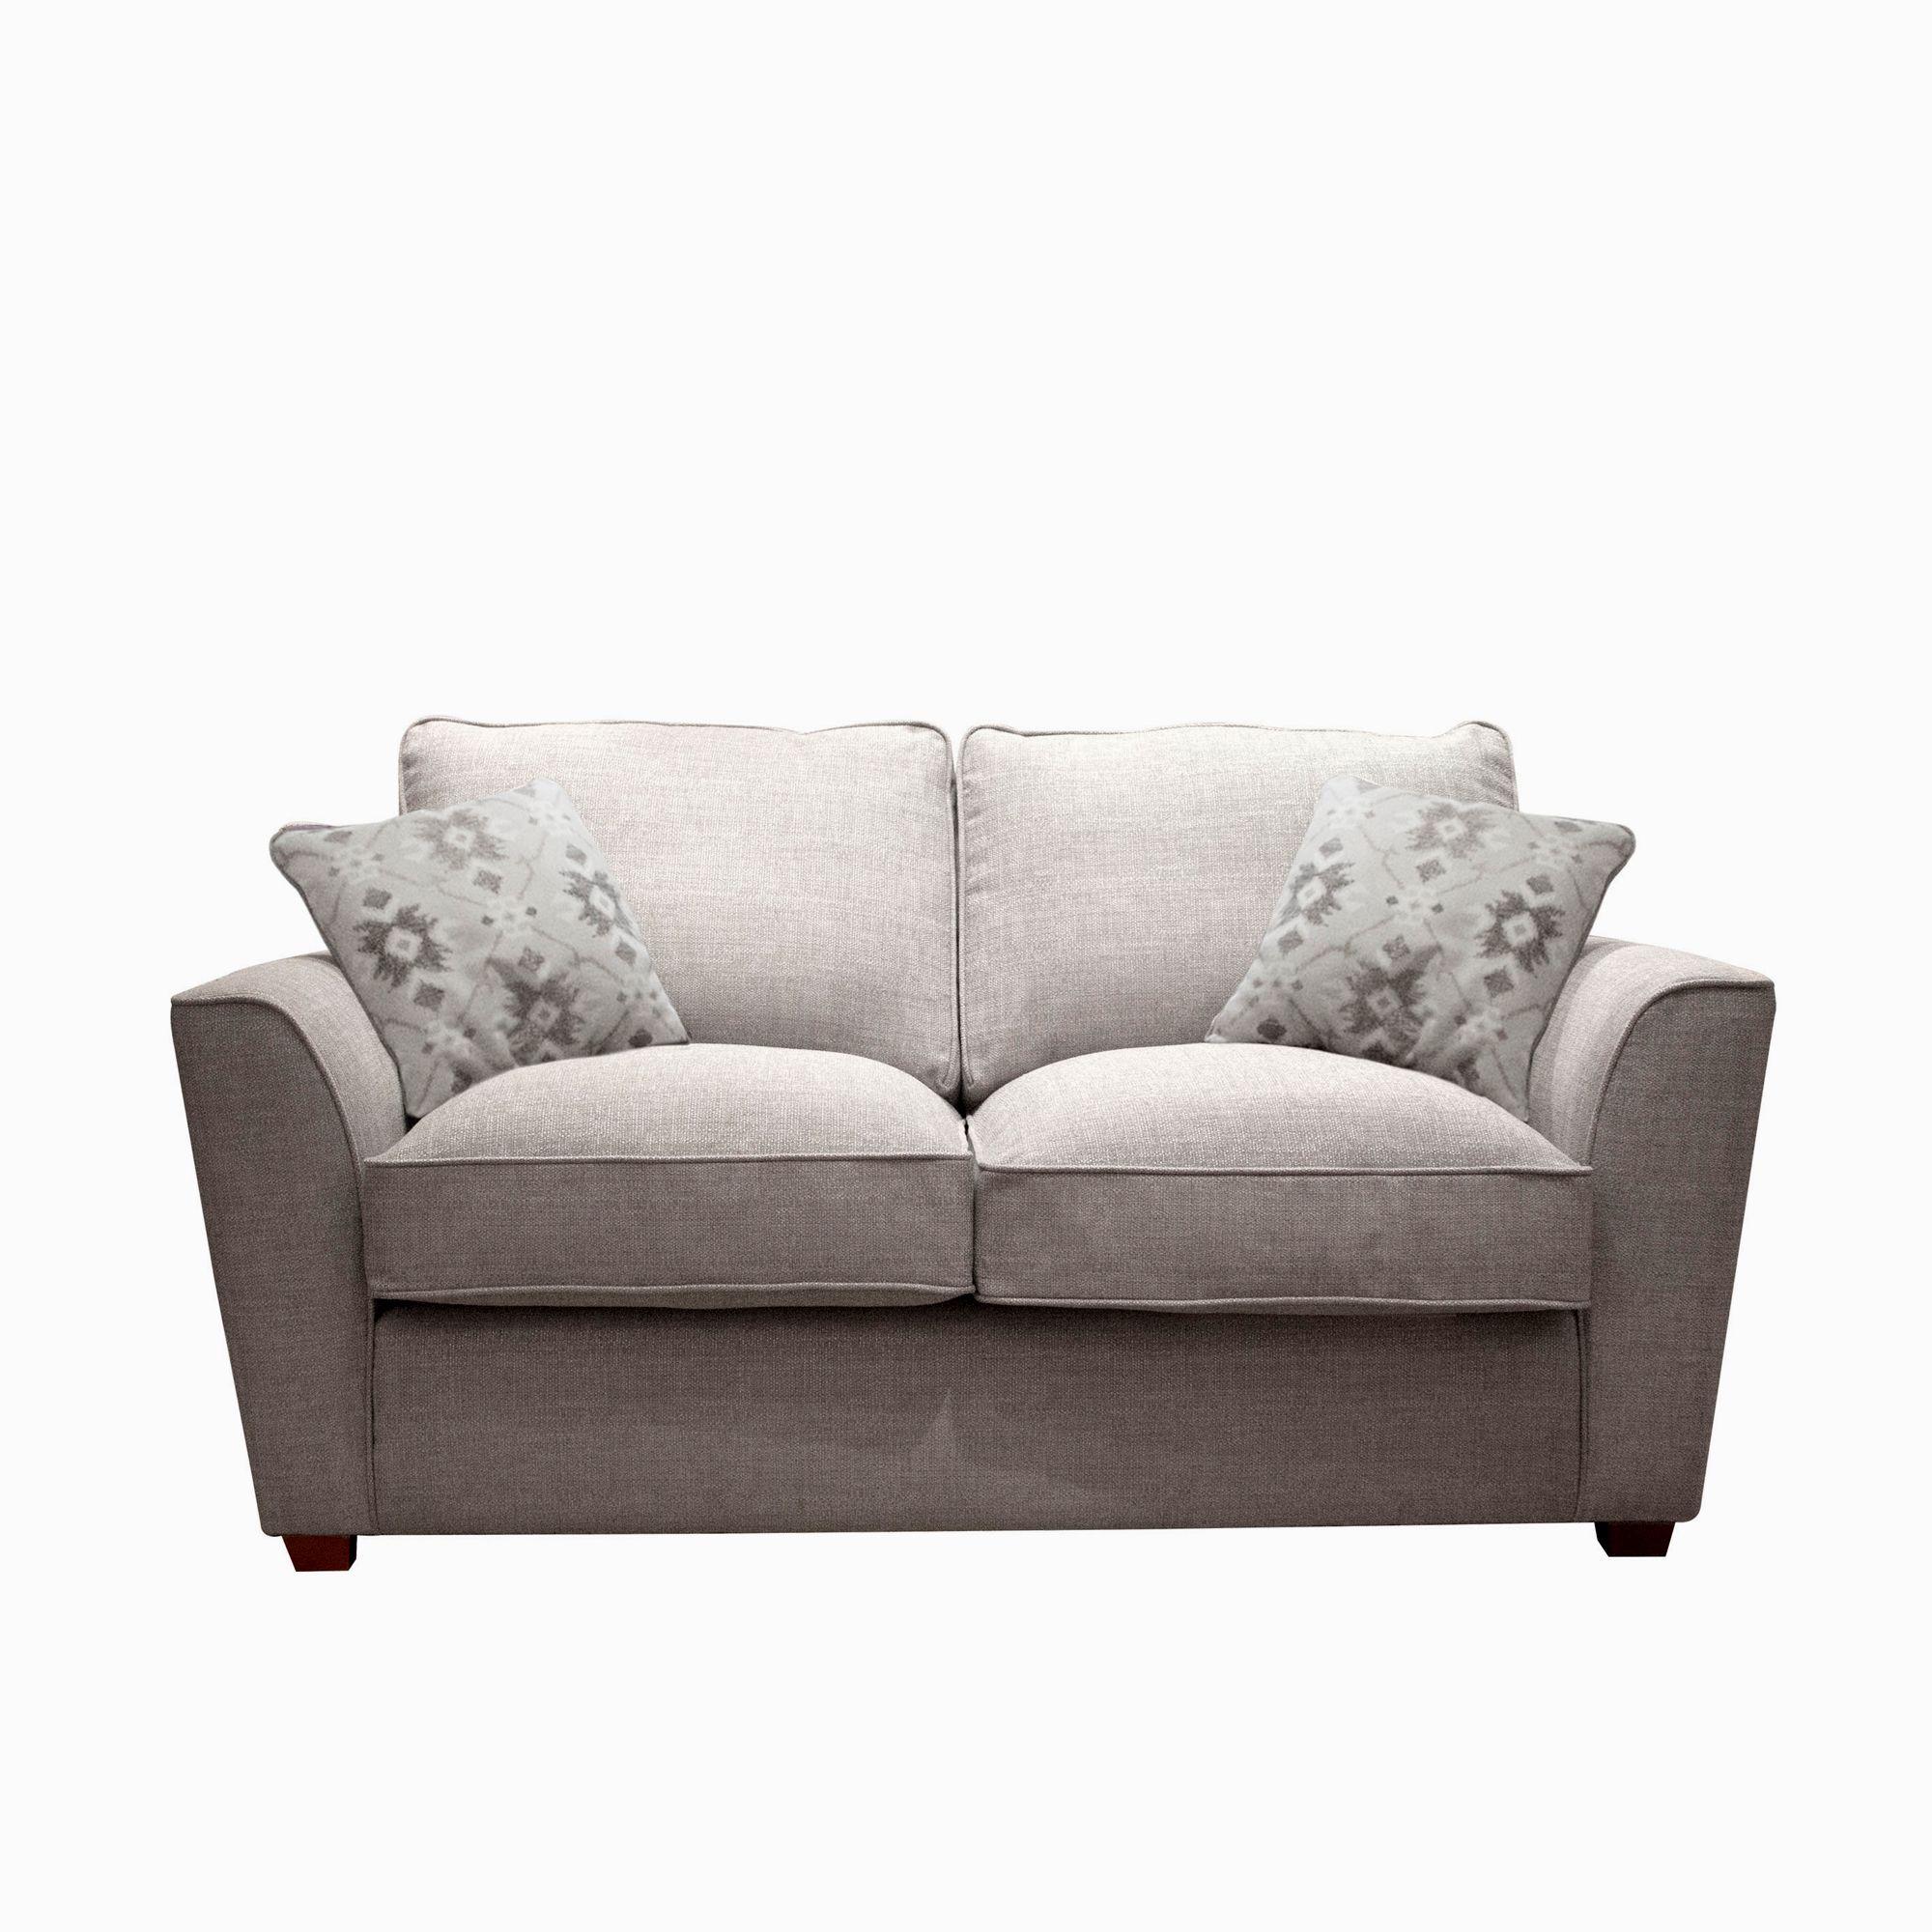 Cookes Collection Philadelphia 2 Seater Sofa